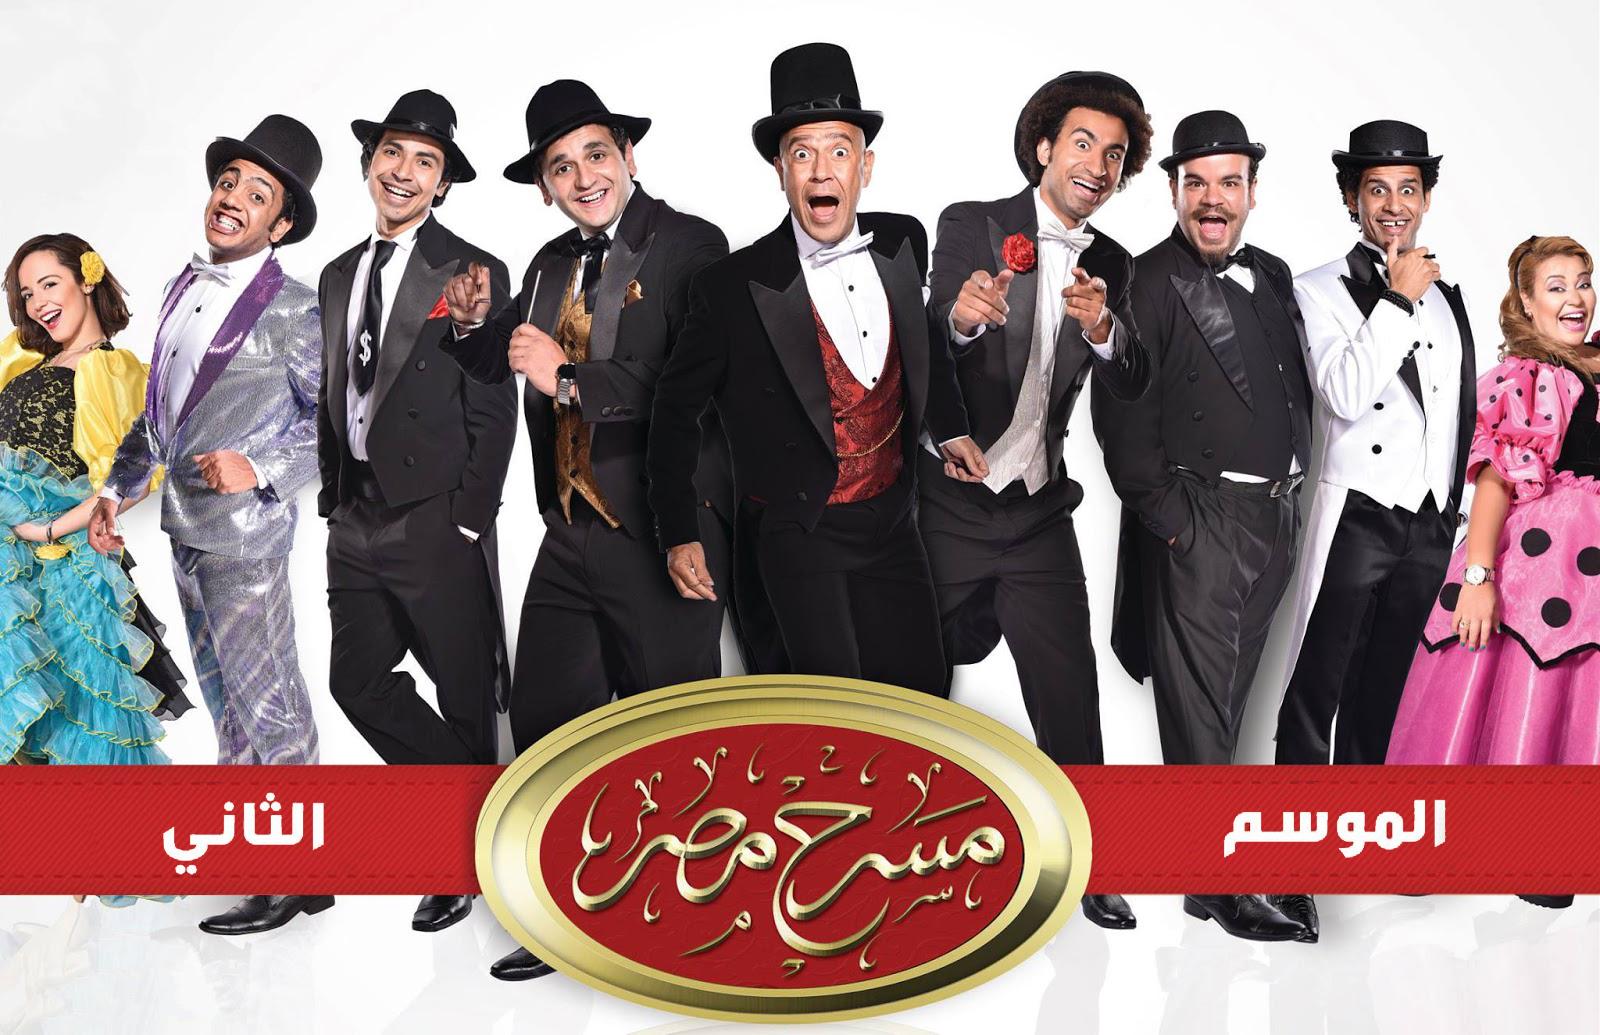 WEB-DL720p | مسرح مصر الموسم الثانى -- Seeders: 1 -- Leechers: 0